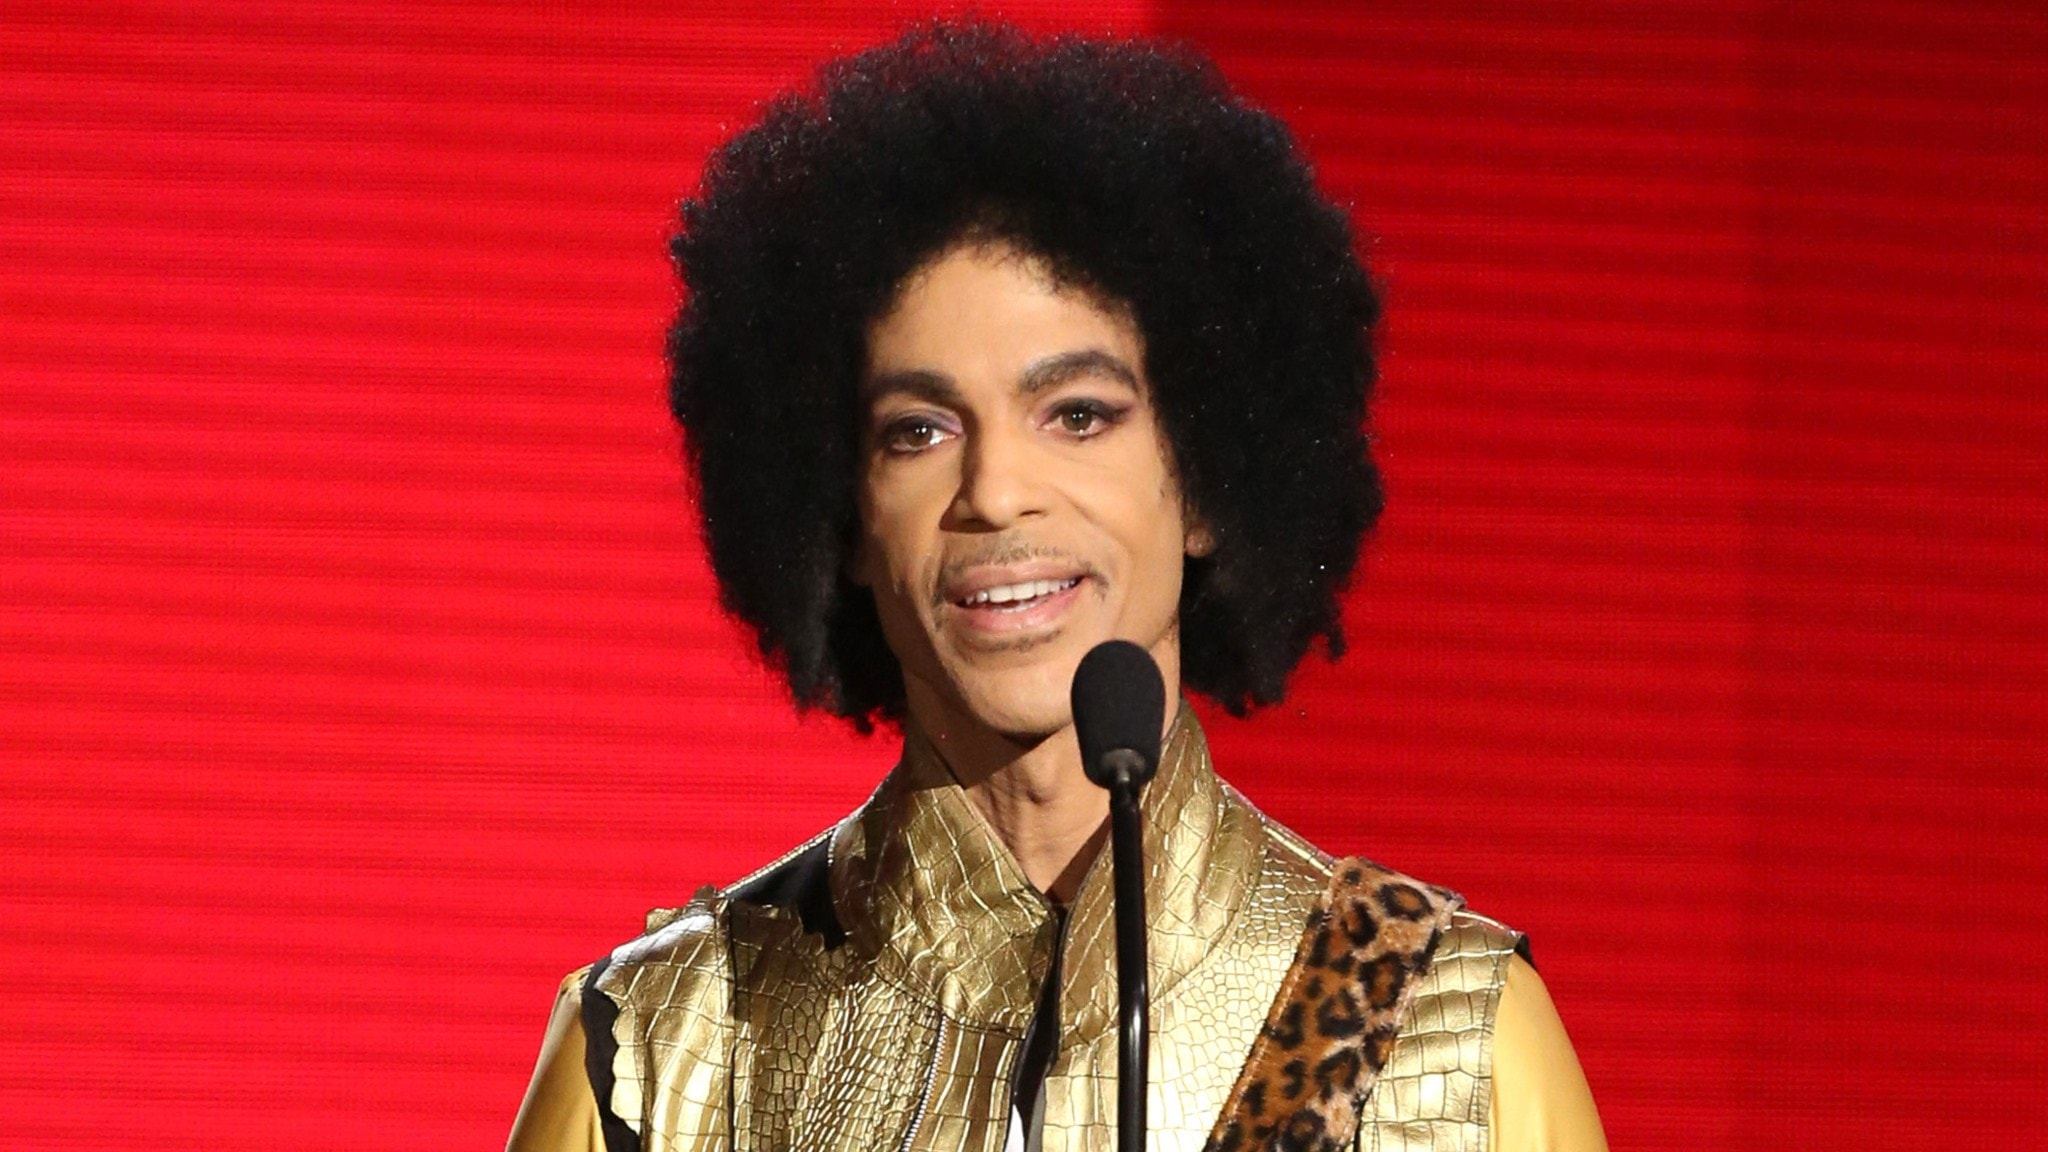 P3 Soul-intervjuer om Prince...